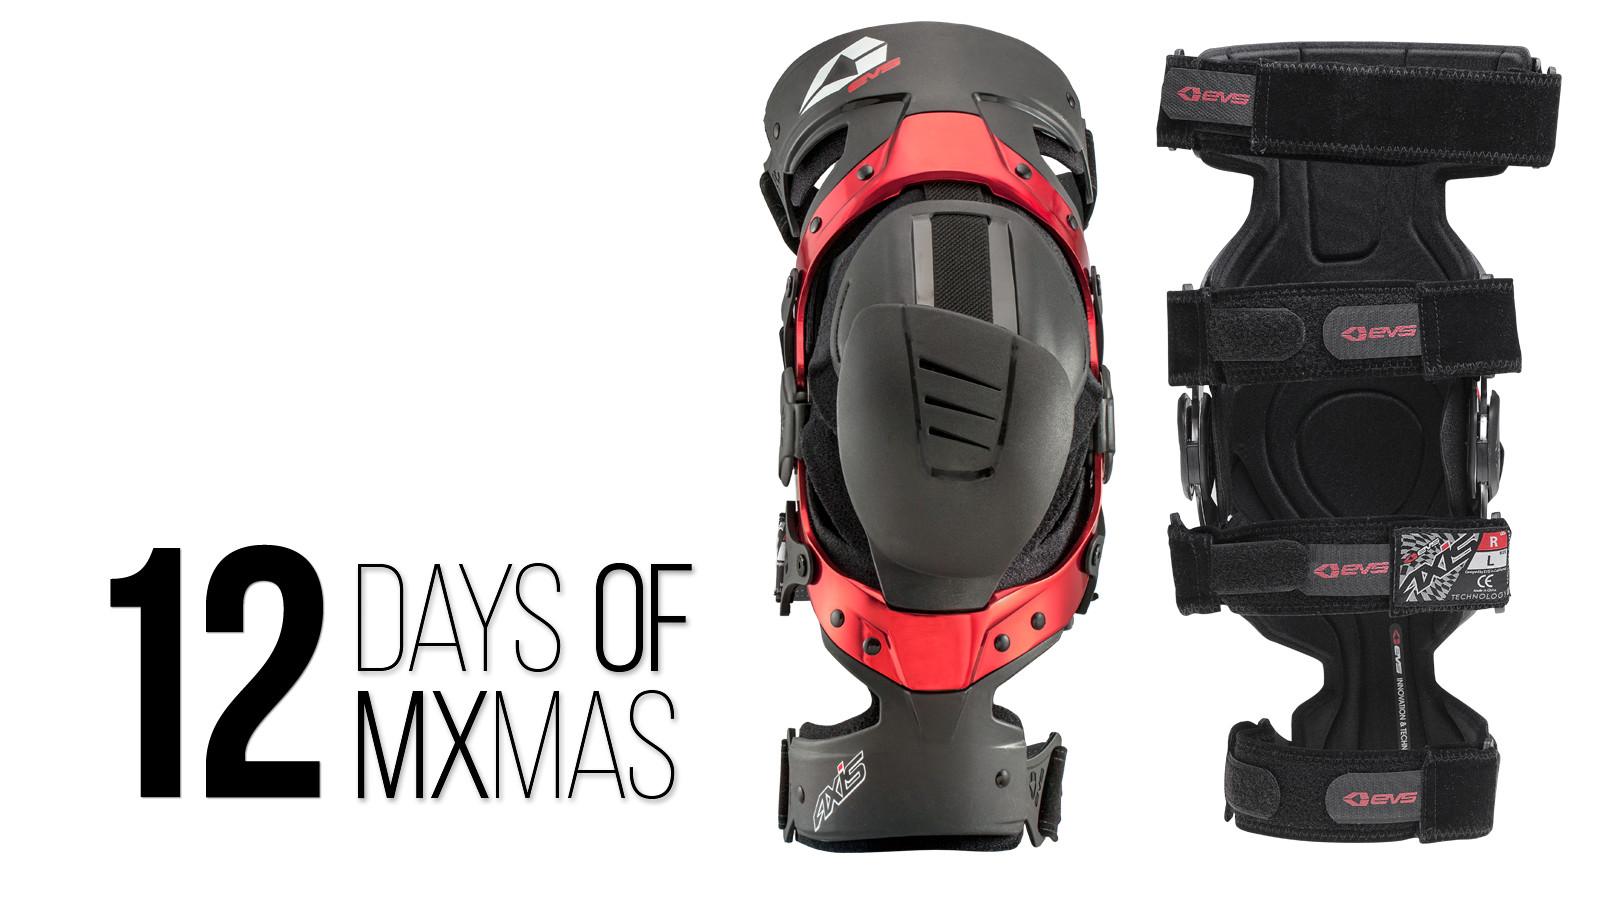 Vital MX 12 Days of MXmas: Day 8